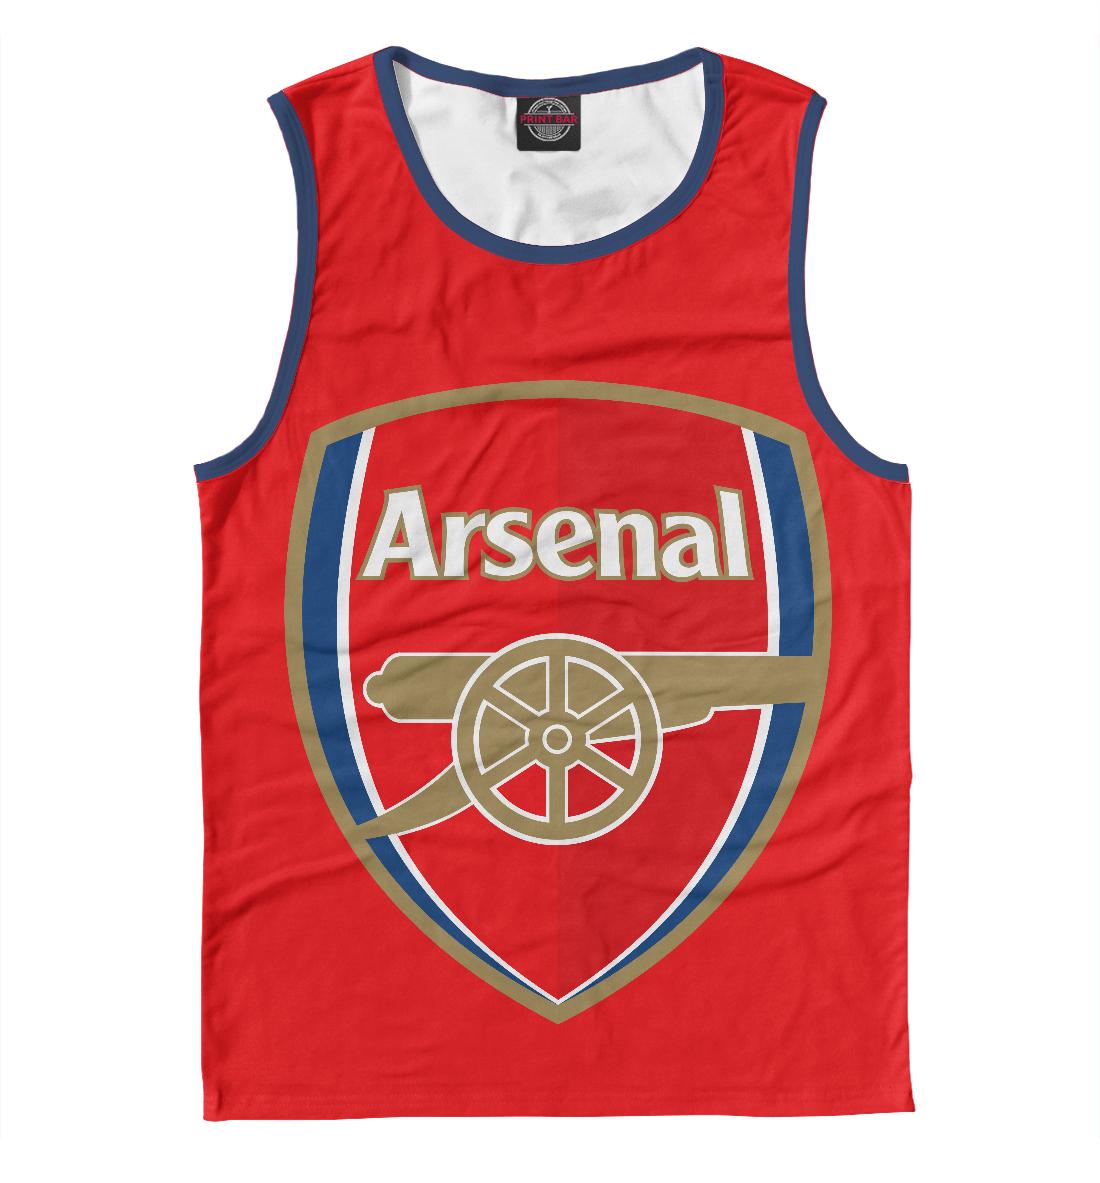 Купить Арсенал, Printbar, Майки, ARS-918476-may-2